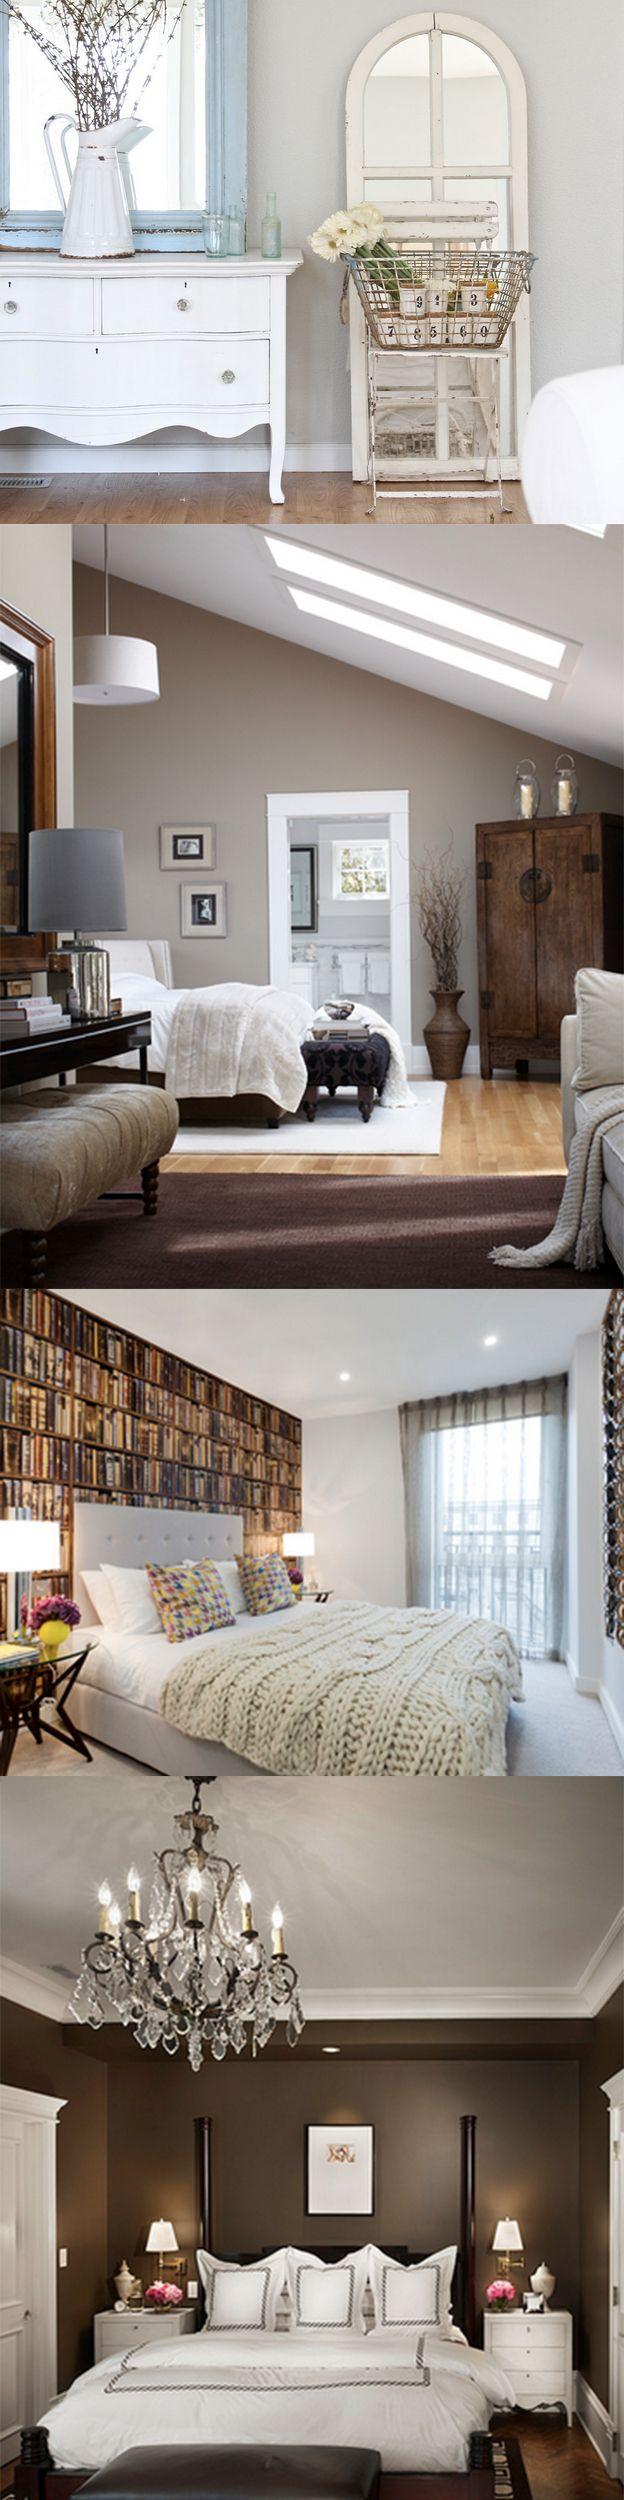 muebles hipopotamo como decorar dormitorio habitacion matrimonio tonos blancos estilo clasico